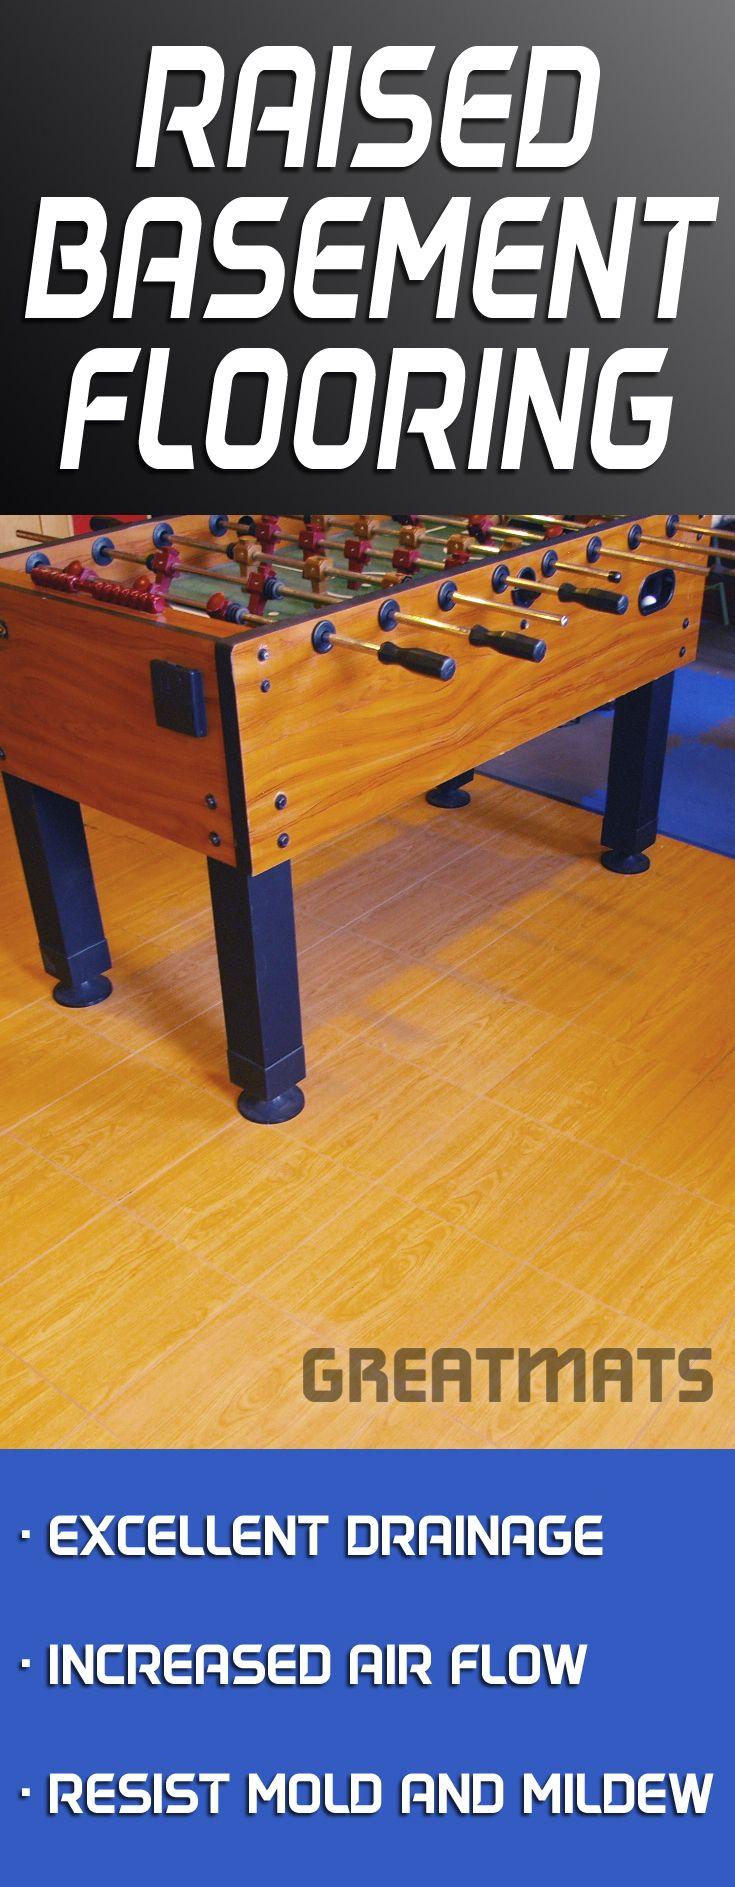 Best Flooring For Damp Basements With Moisture Problems Basement - Best flooring for moist basement